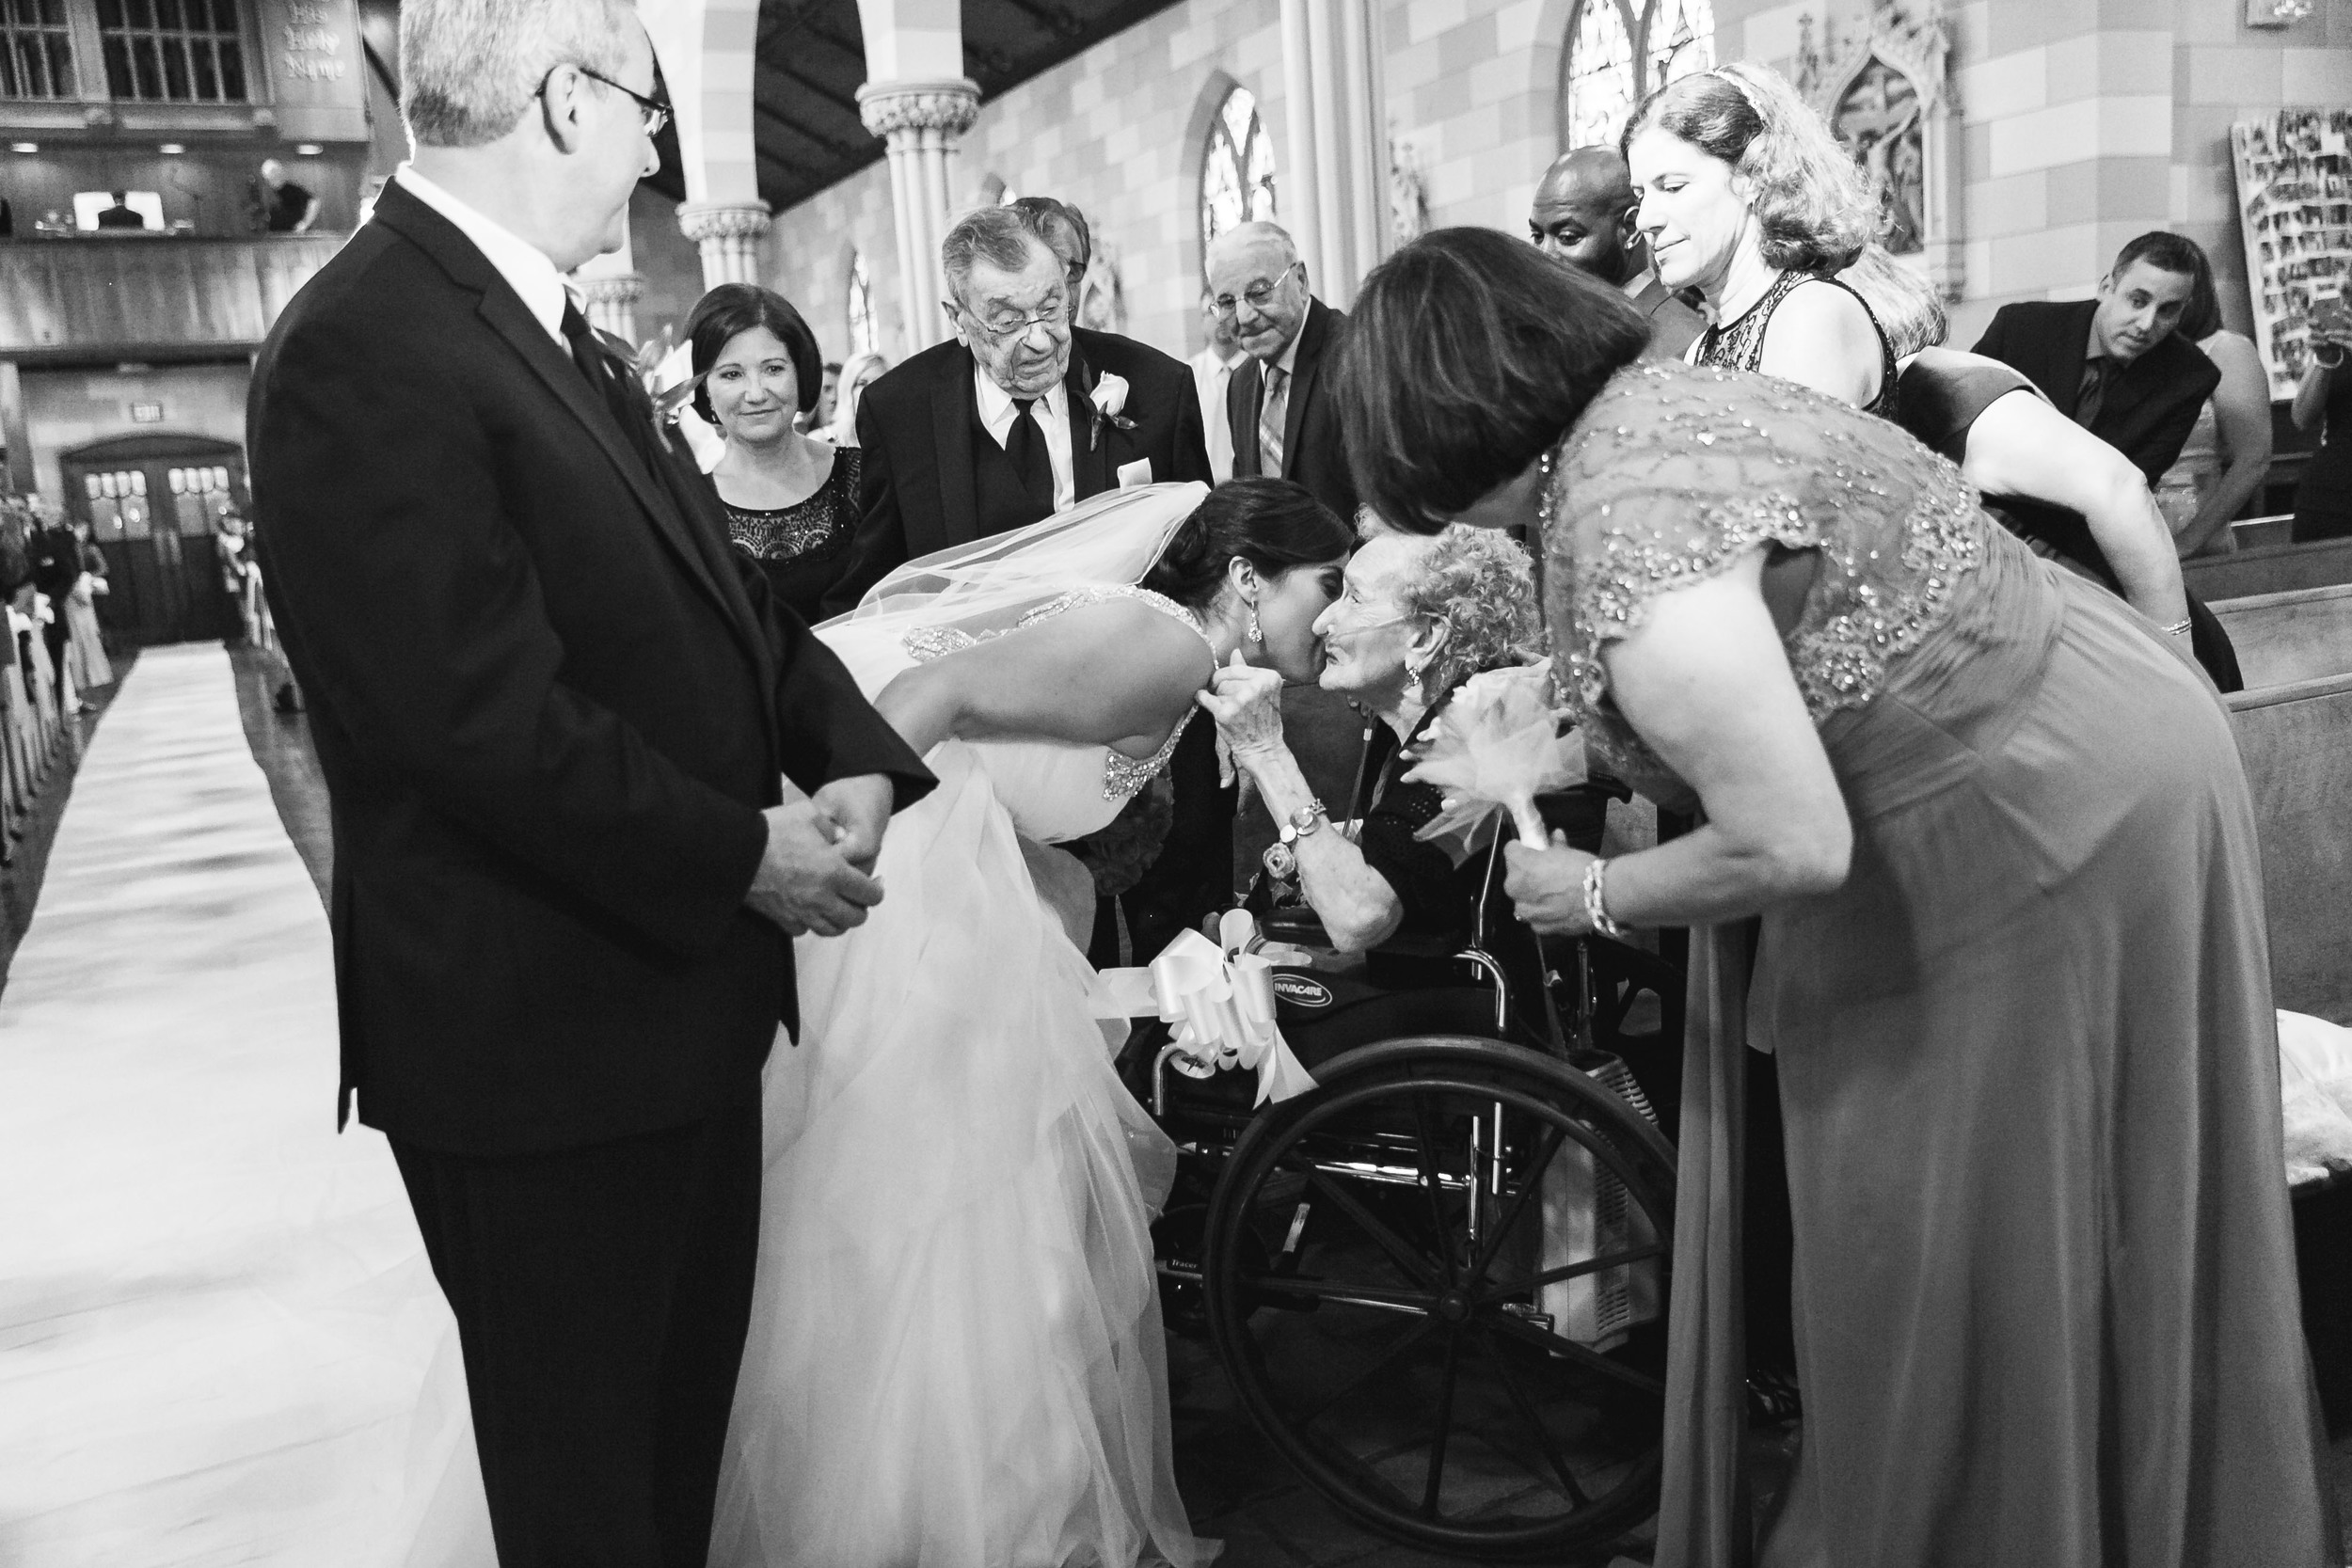 Summer-American-Wedding-Anthonys-Ocean-View-New-Haven-Documentary-Wedding-Photographer-Jacek-Dolata-6.jpg